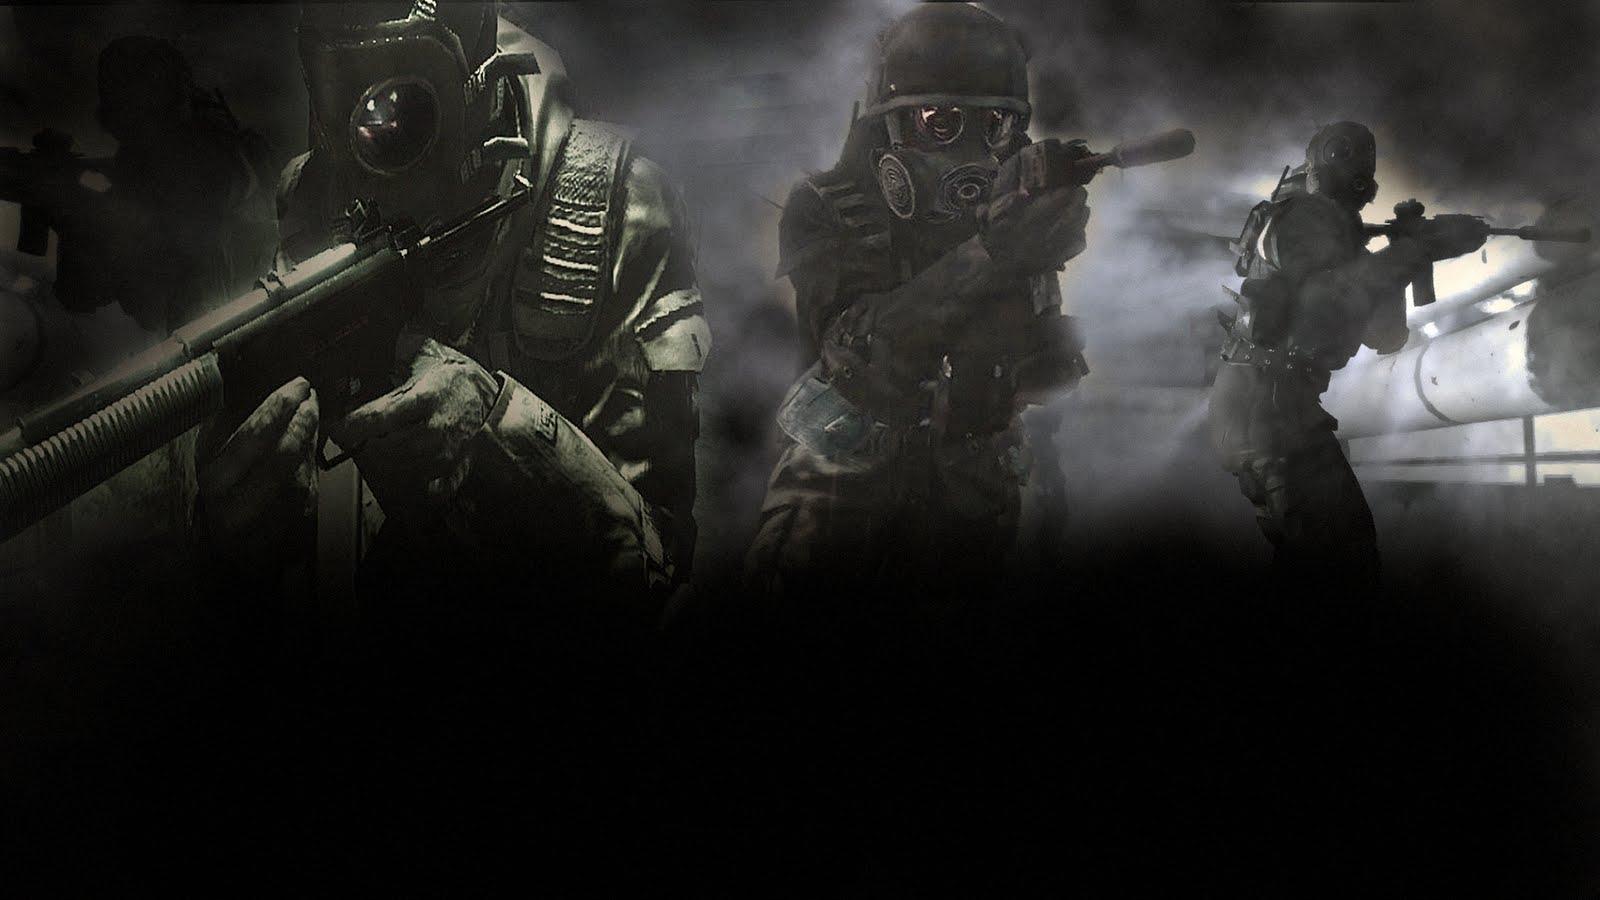 Top hd wallpapers call of duty 4 modern warfare wallpapers - Call of duty warfare wallpaper ...